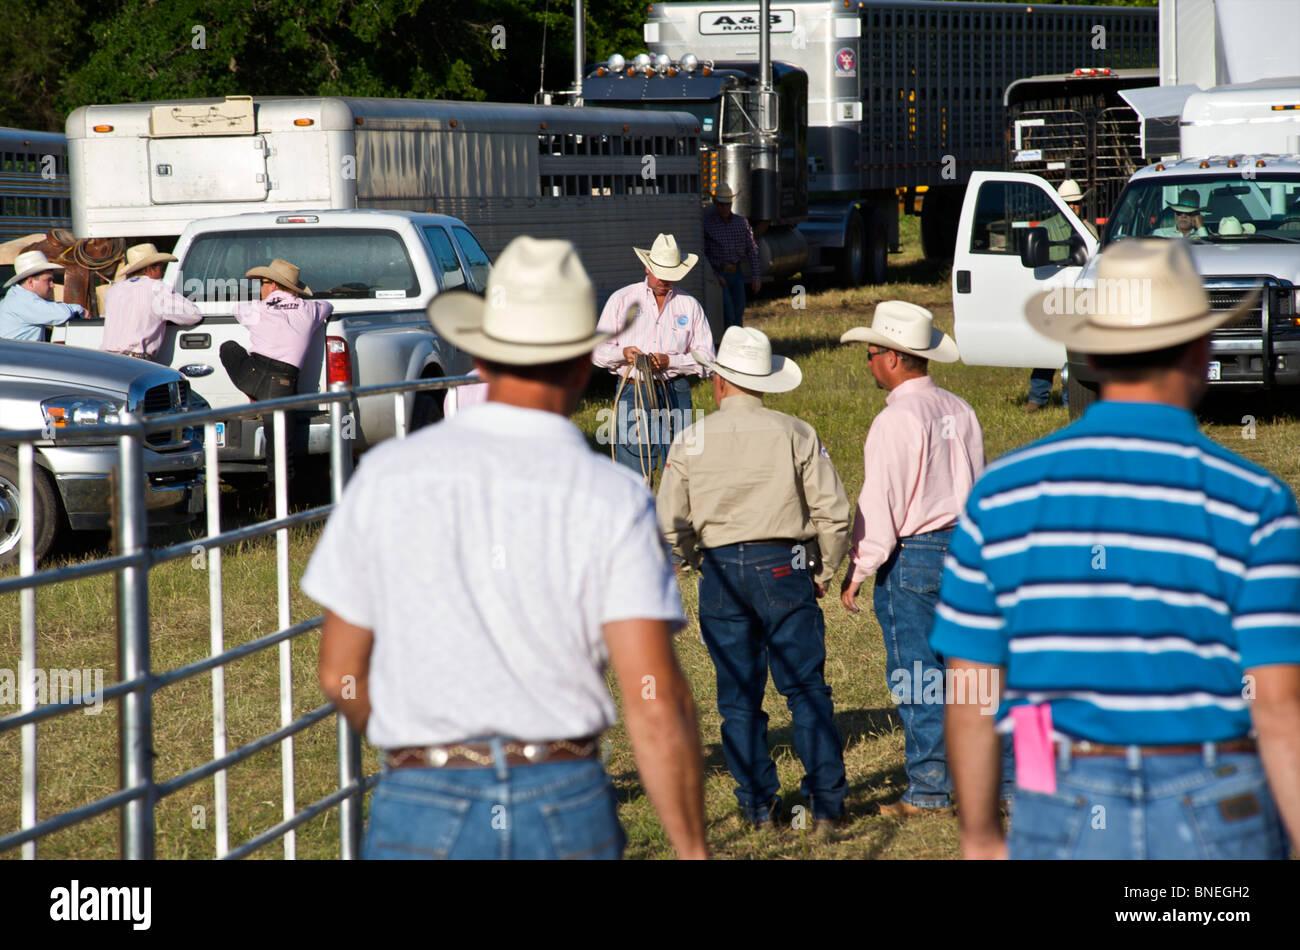 Cowboy-Mitglieder des PRCA Rodeo Veranstaltung in Bridgeport, Texas, USA Stockfoto